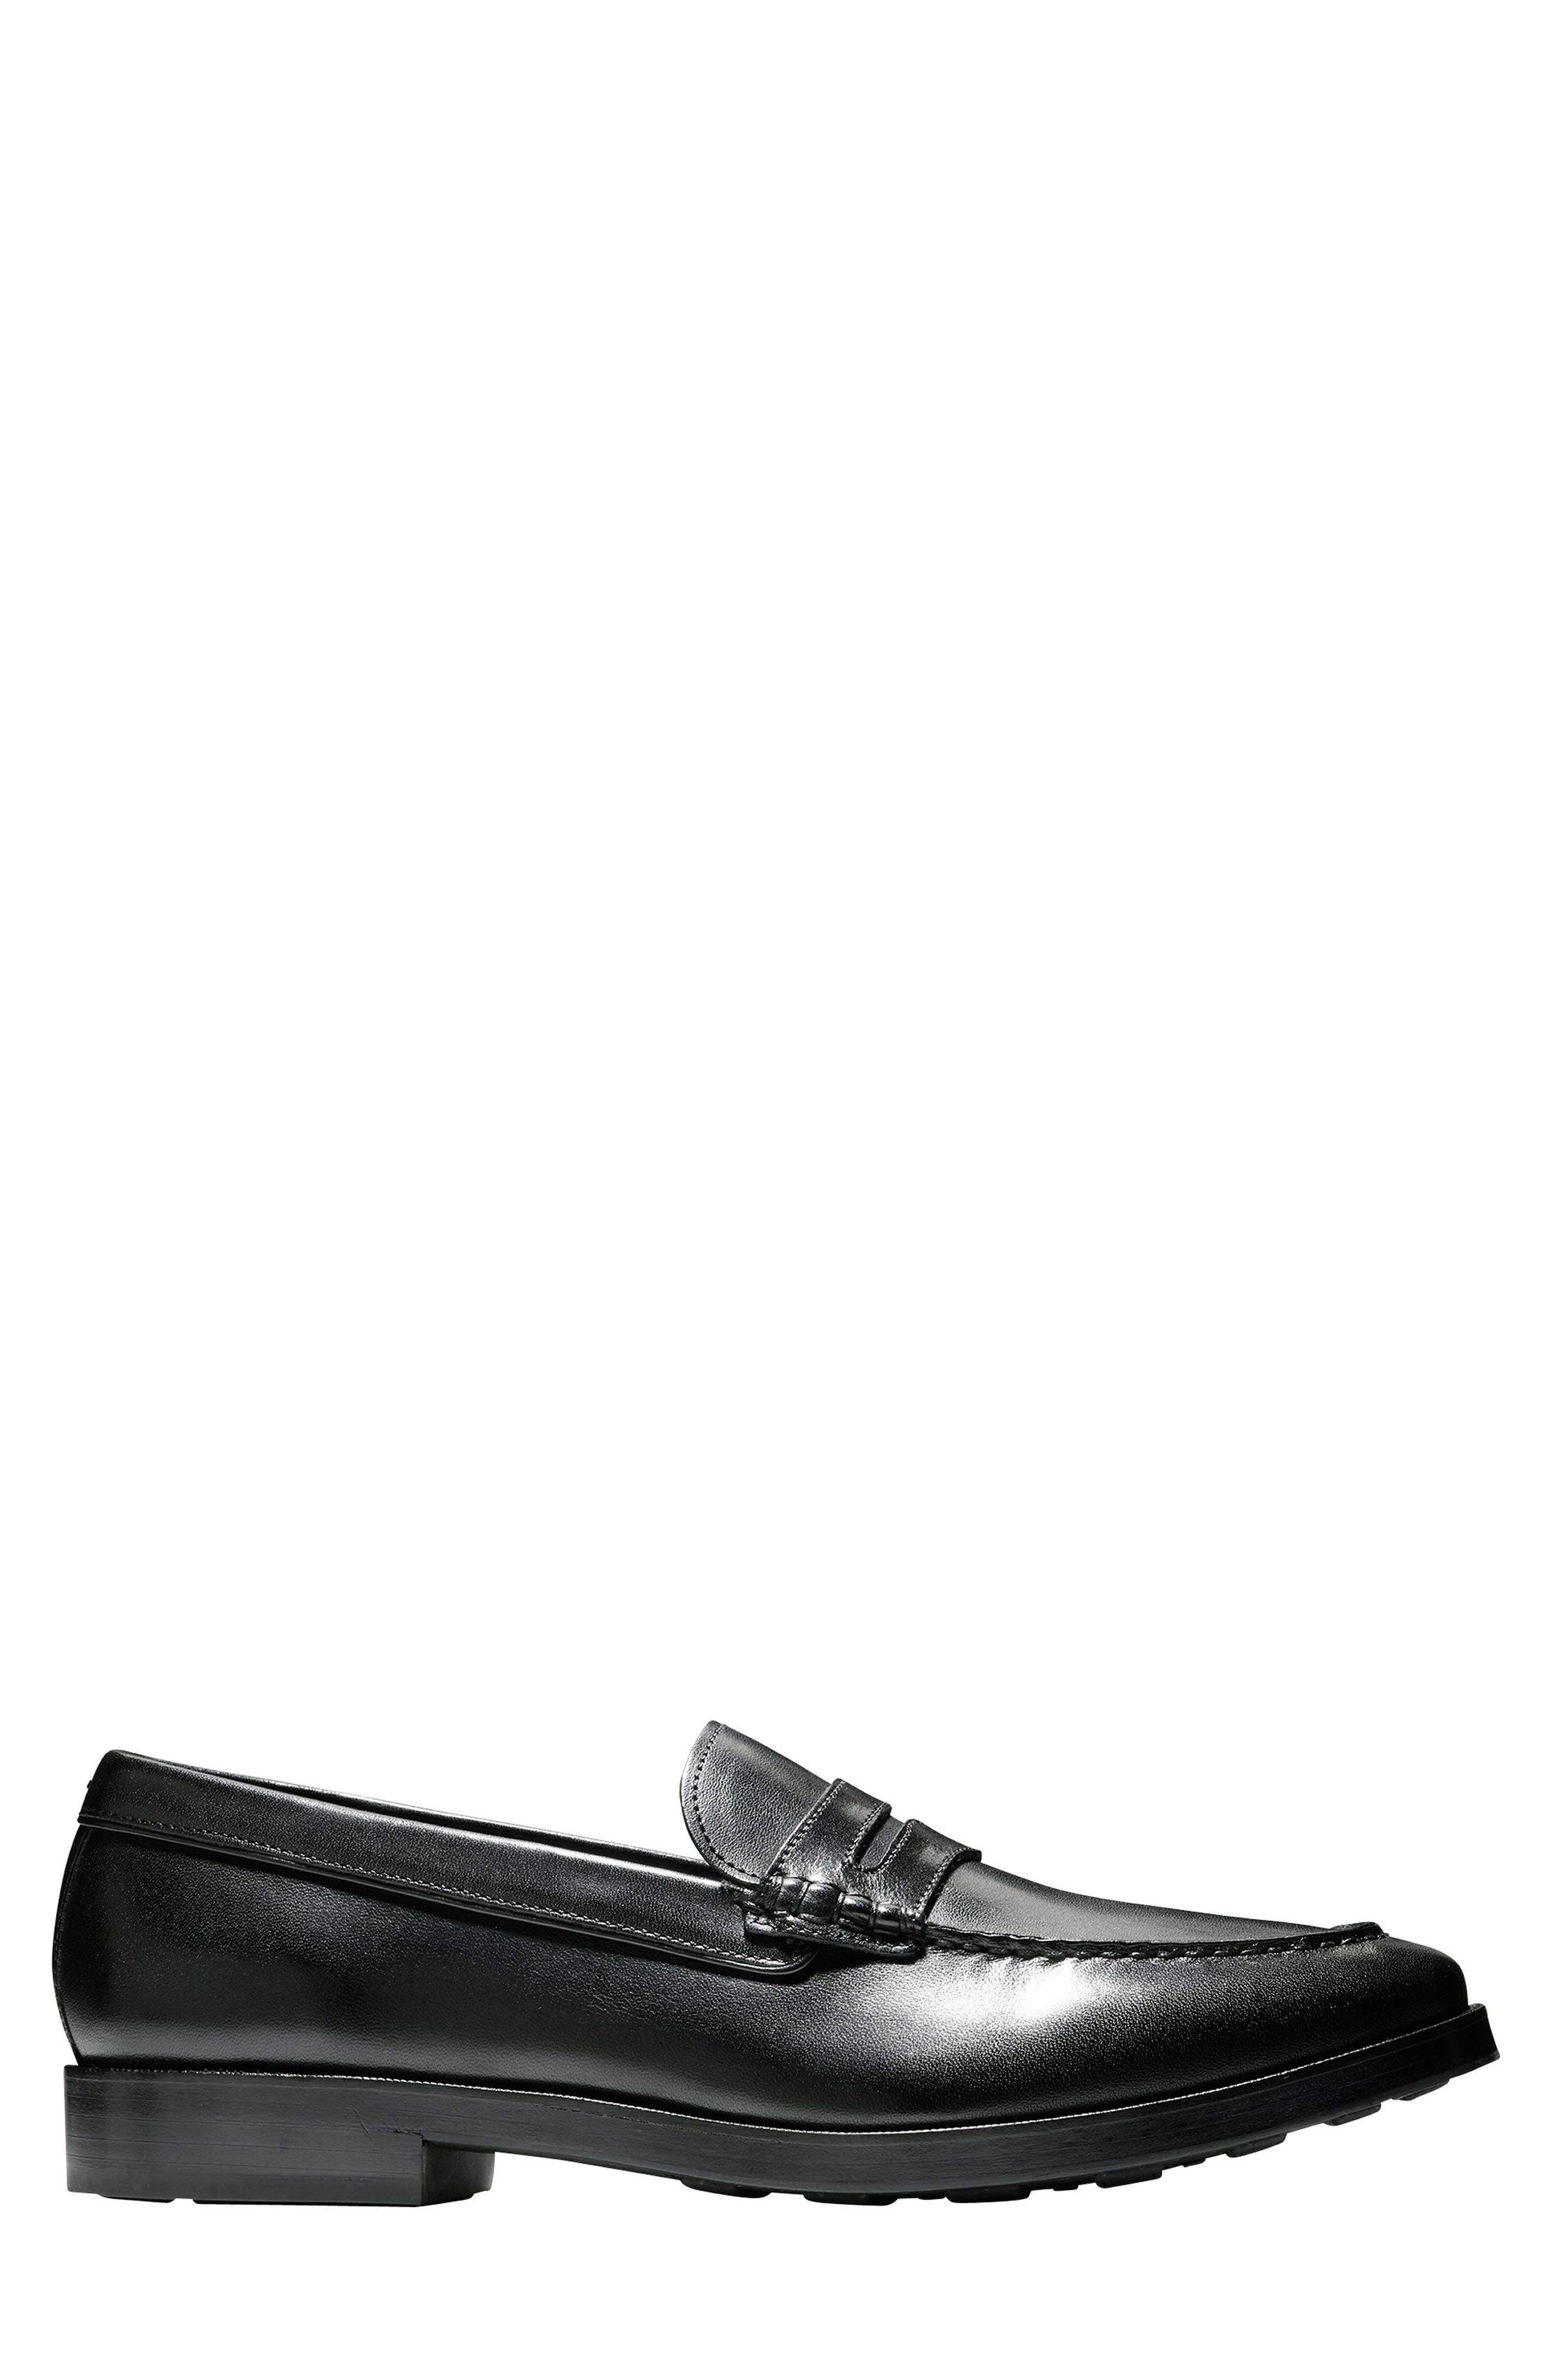 Hamilton Grand Penny Loafer,                             Alternate thumbnail 3, color,                             Black Leather